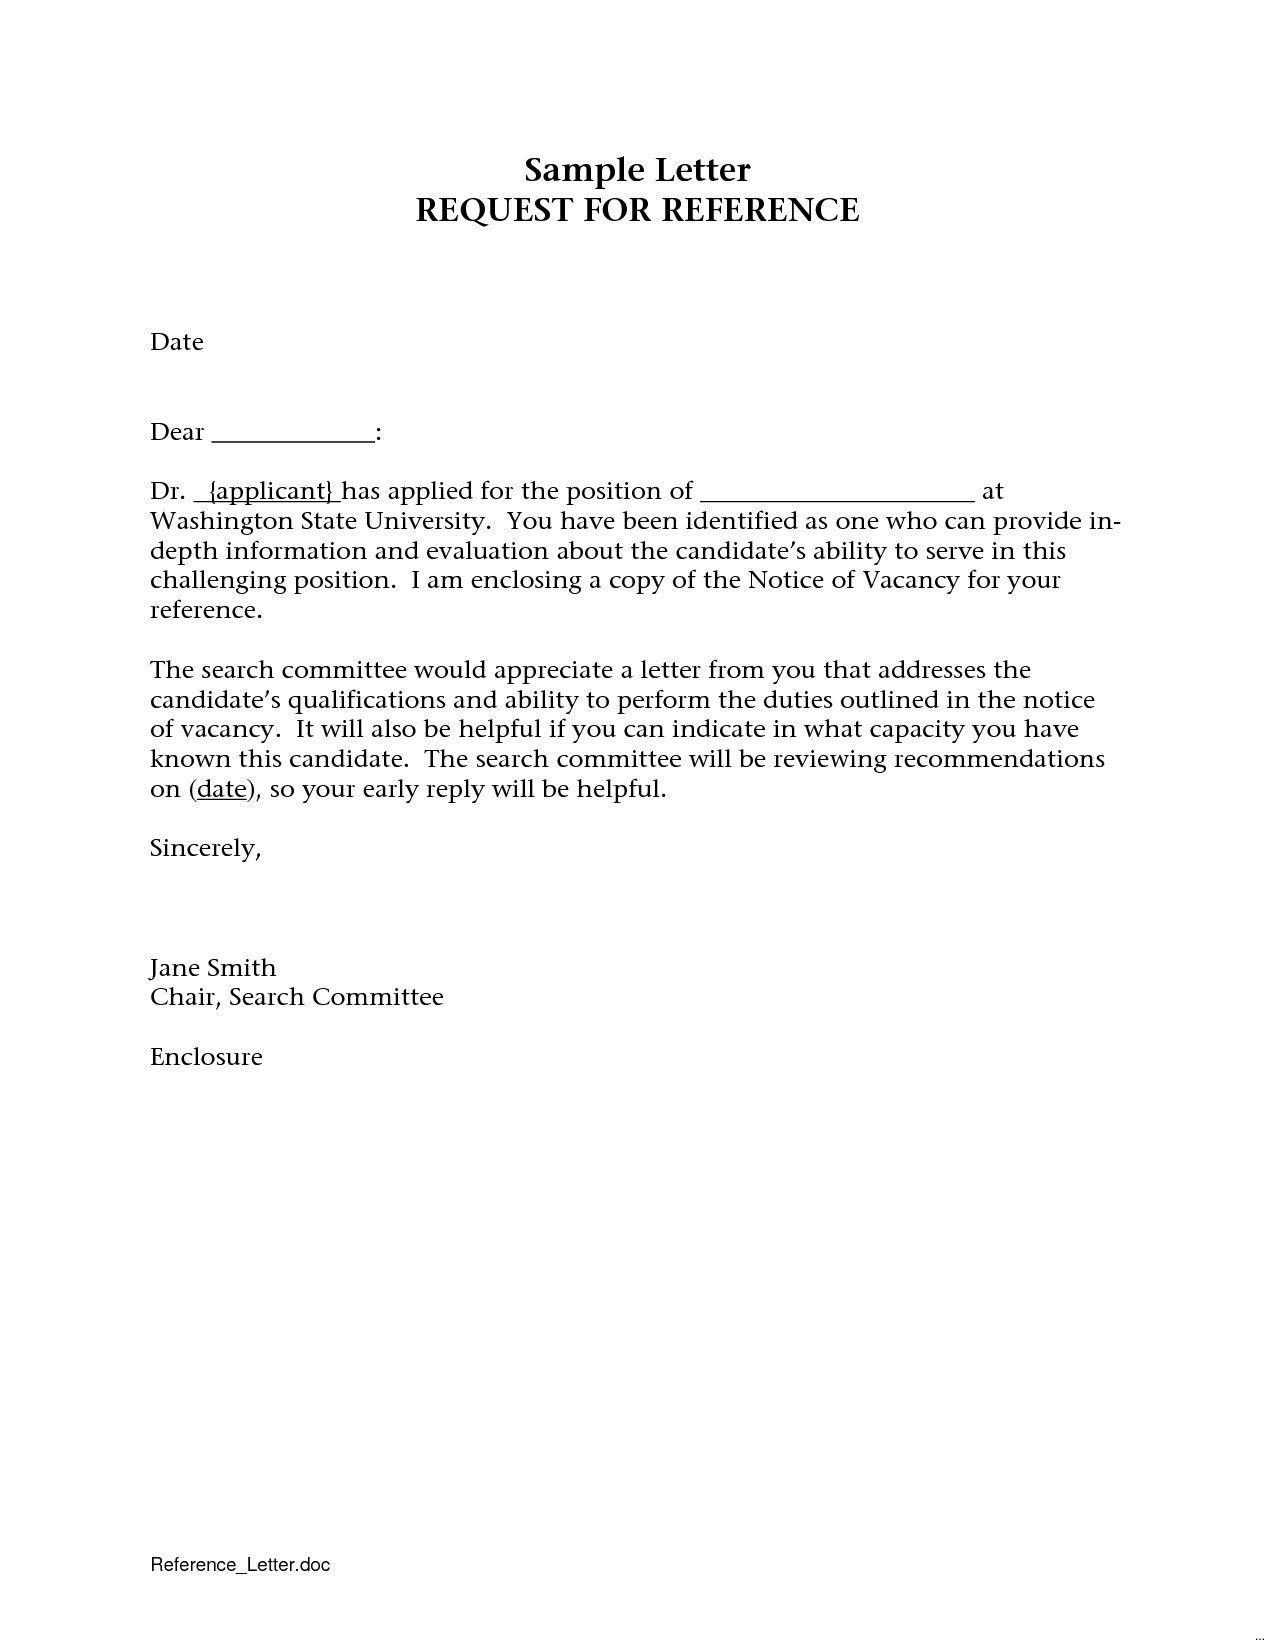 001 Remarkable Sample Request For Letter Of Recommendation Design  From Previou Employer NursingFull